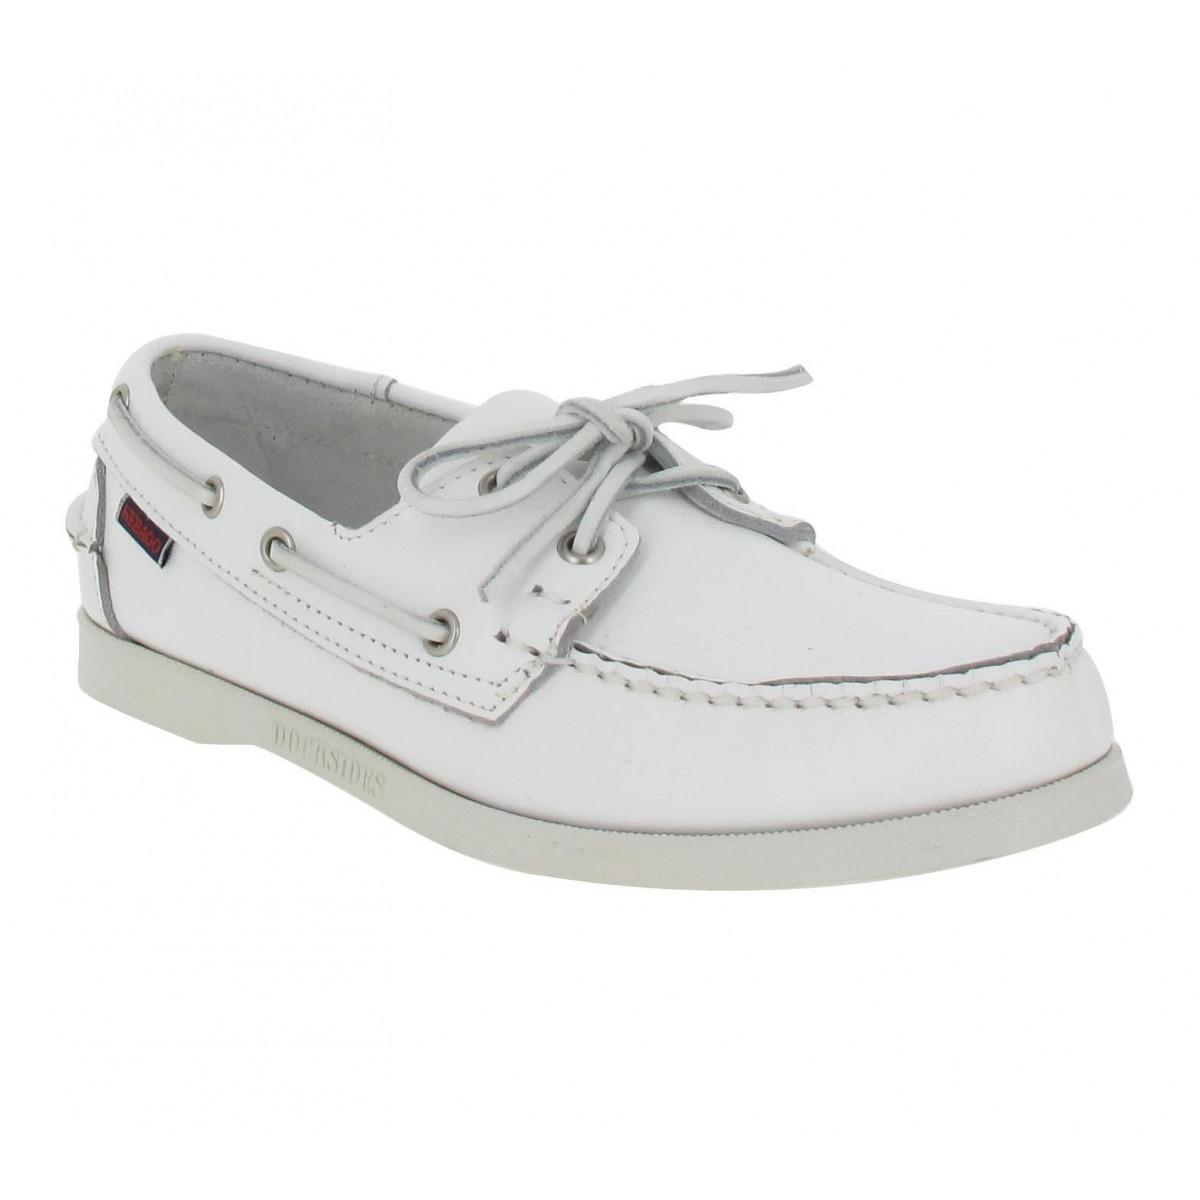 Chaussures bateaux SEBAGO Docksides cuir Homme Blanc